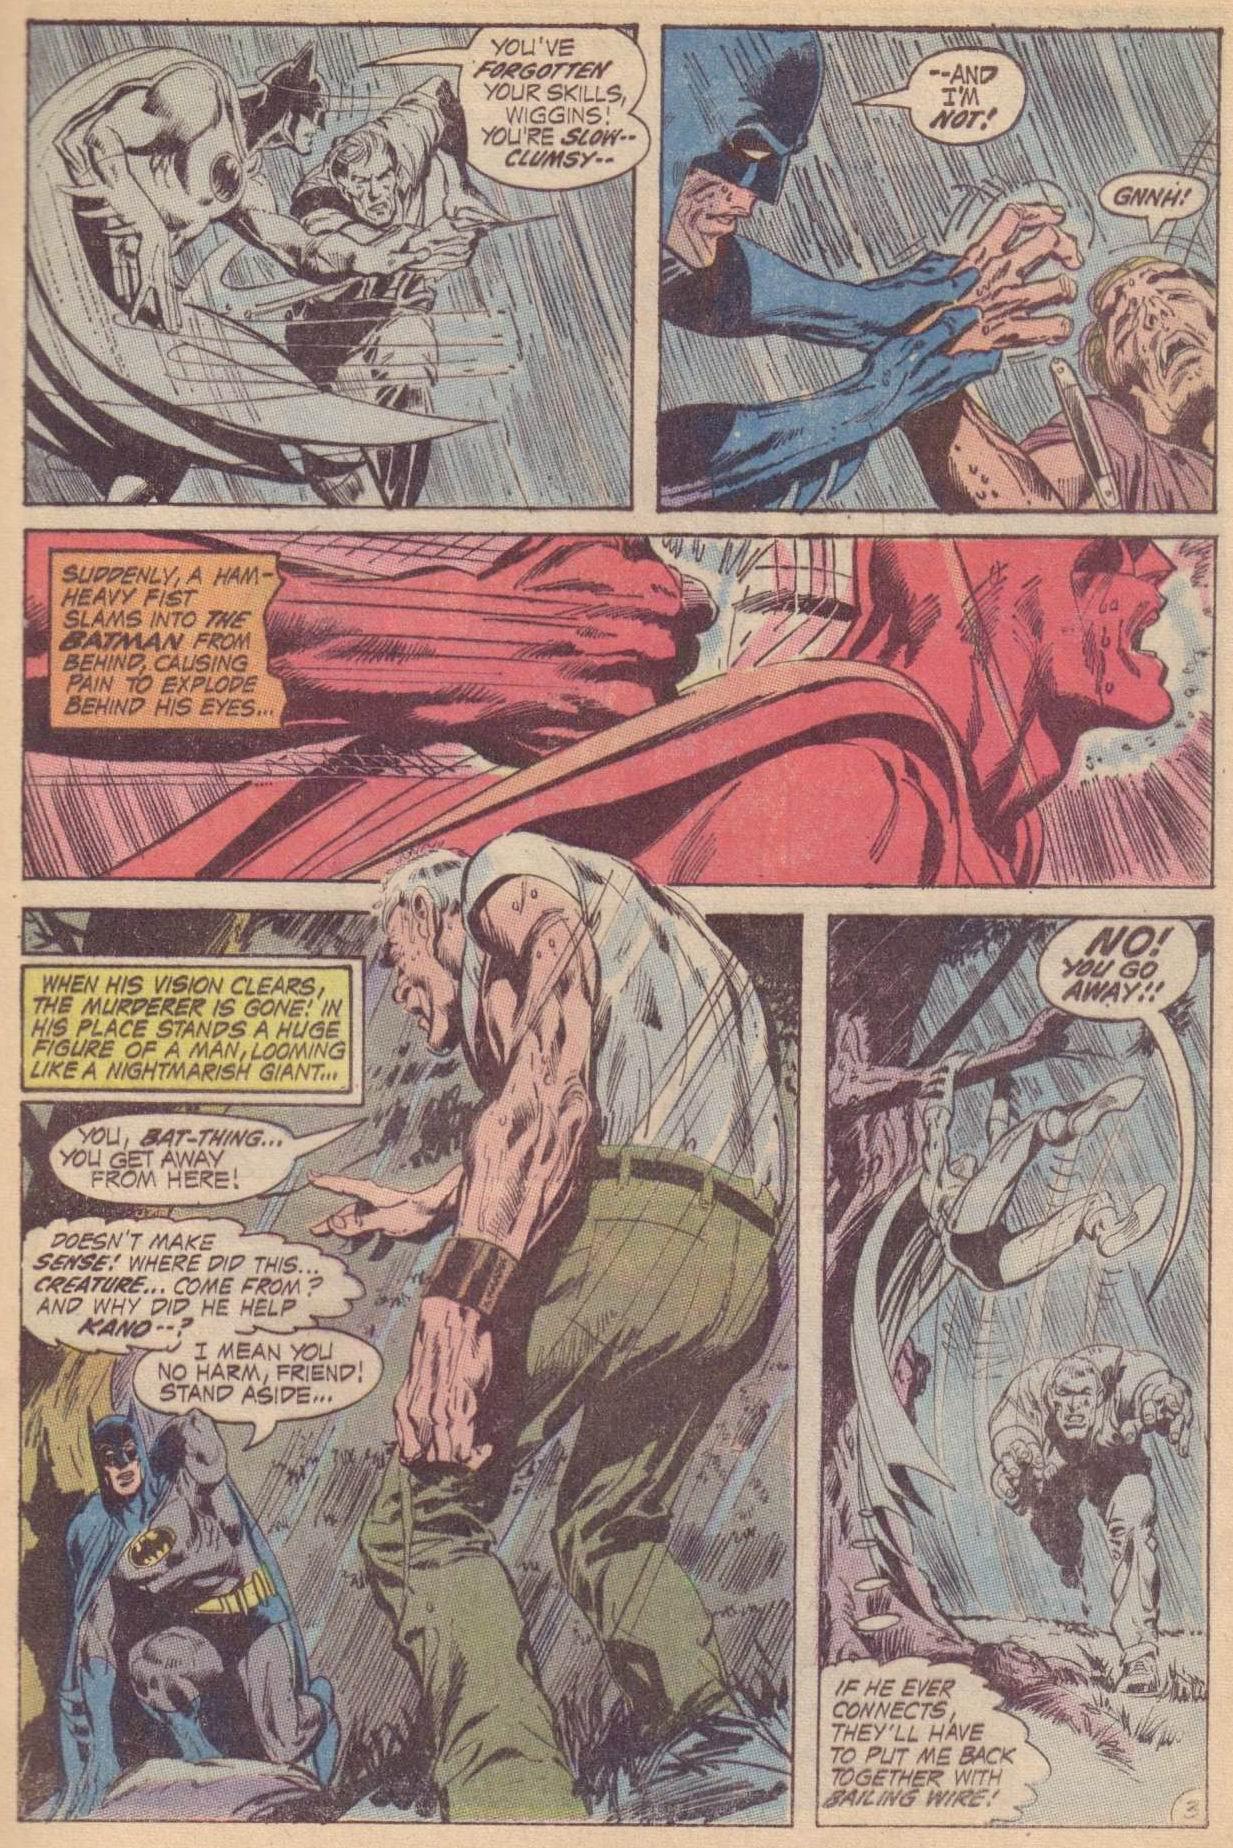 Detective Comics 1937 Issue 410 | Viewcomic reading comics